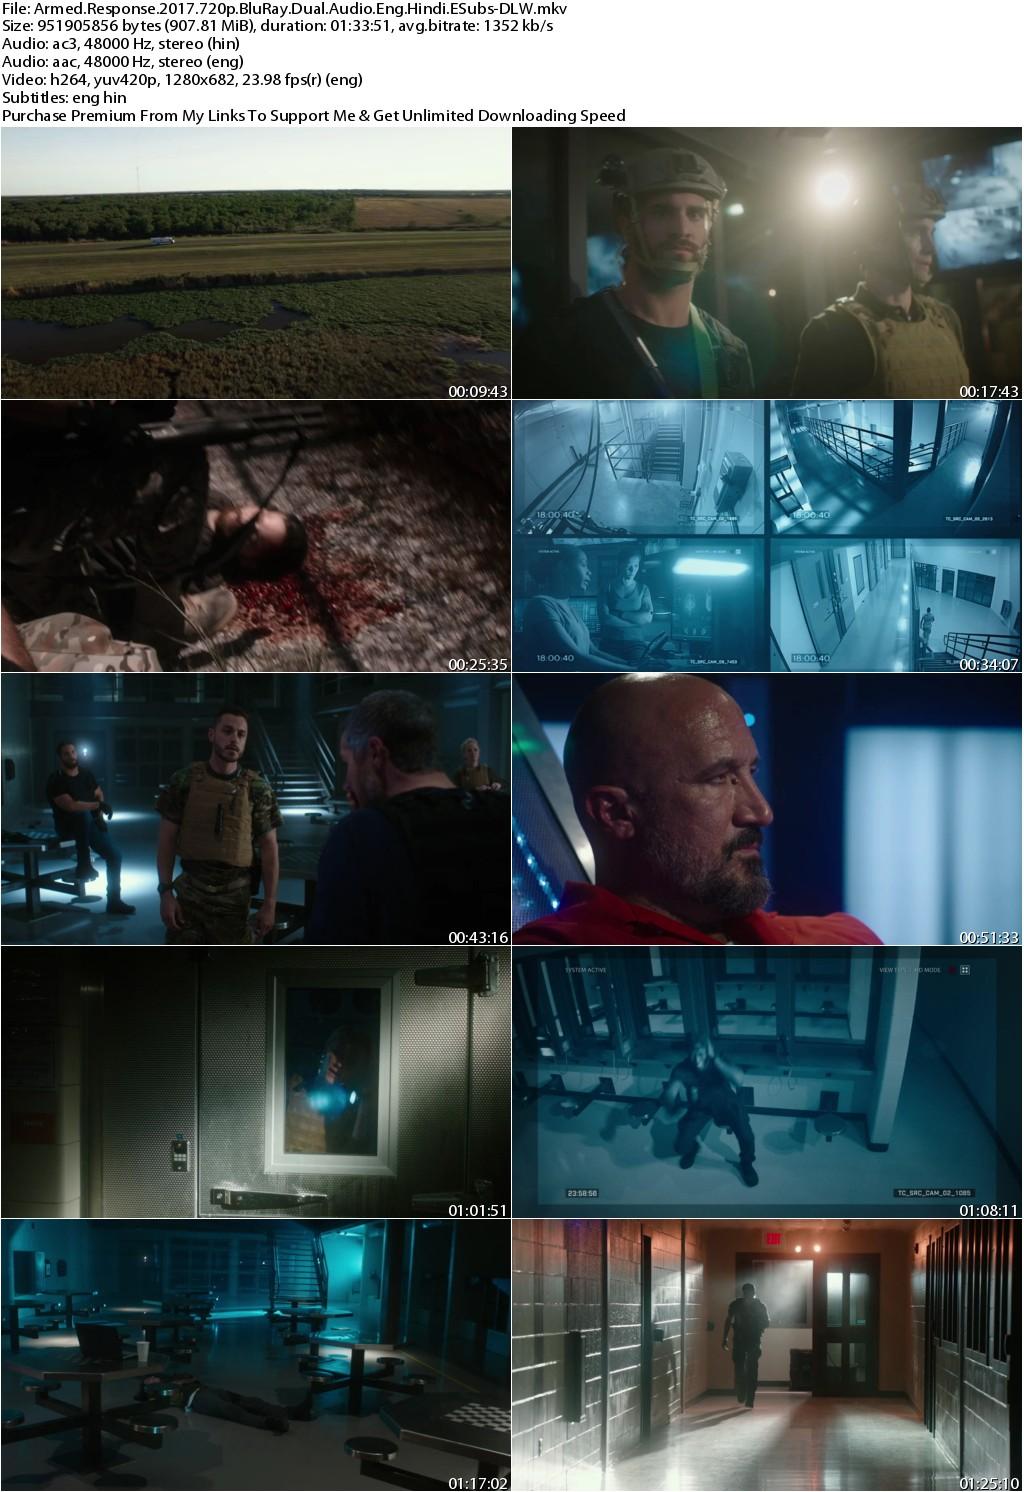 Armed Response (2017) 720p BluRay Dual Audio Eng Hindi ESubs-DLW